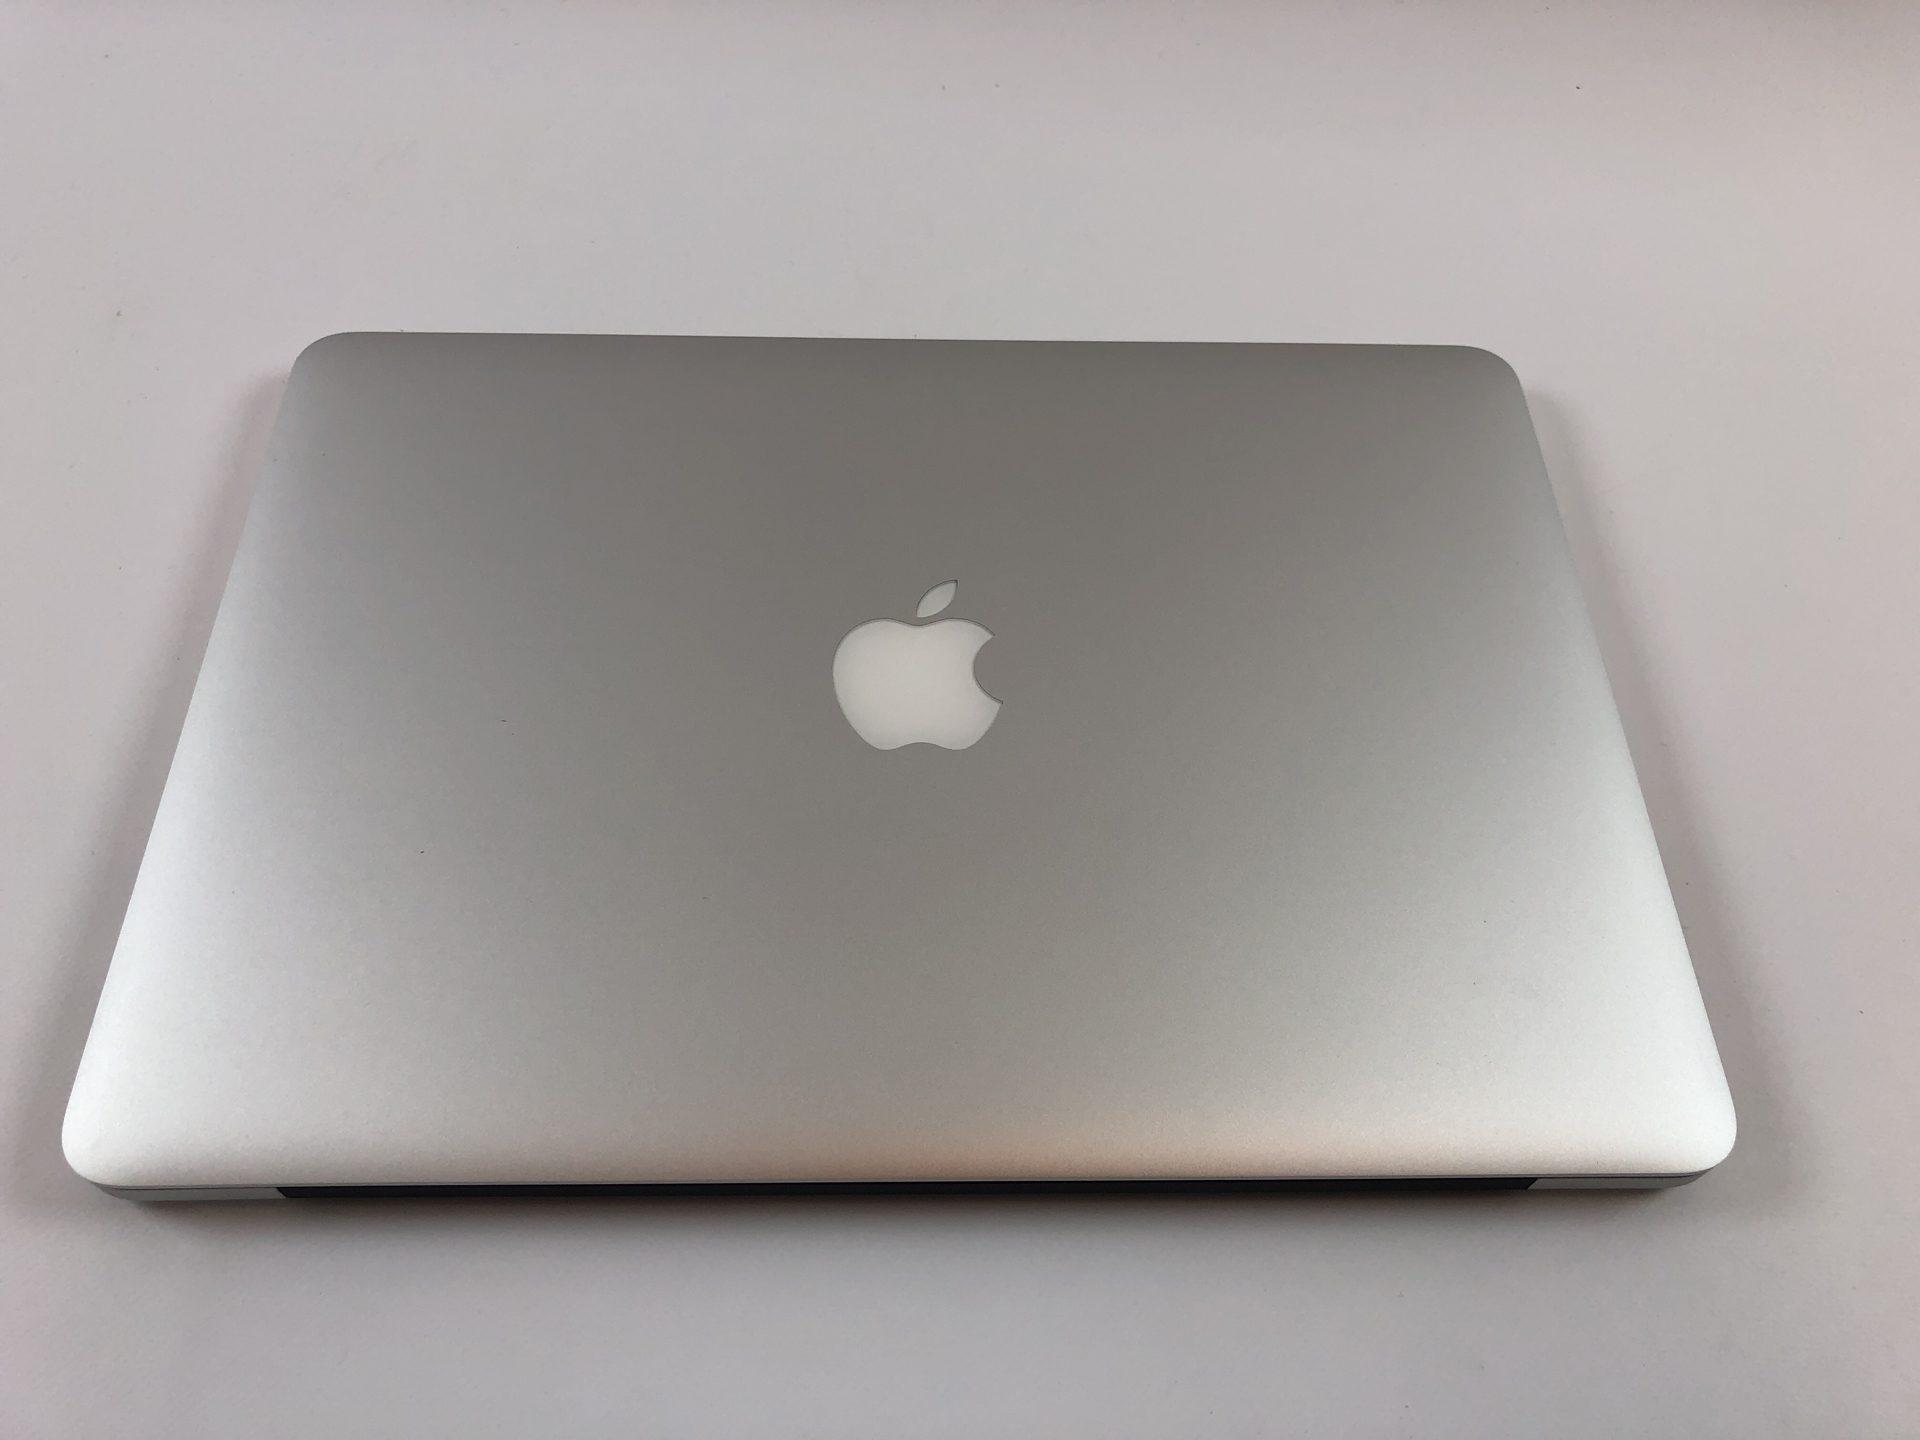 "MacBook Pro Retina 13"" Late 2013 (Intel Core i7 2.8 GHz 16 GB RAM 512 GB SSD), Intel Core i7 2.8 GHz, 16 GB RAM, 512 GB SSD, bild 2"